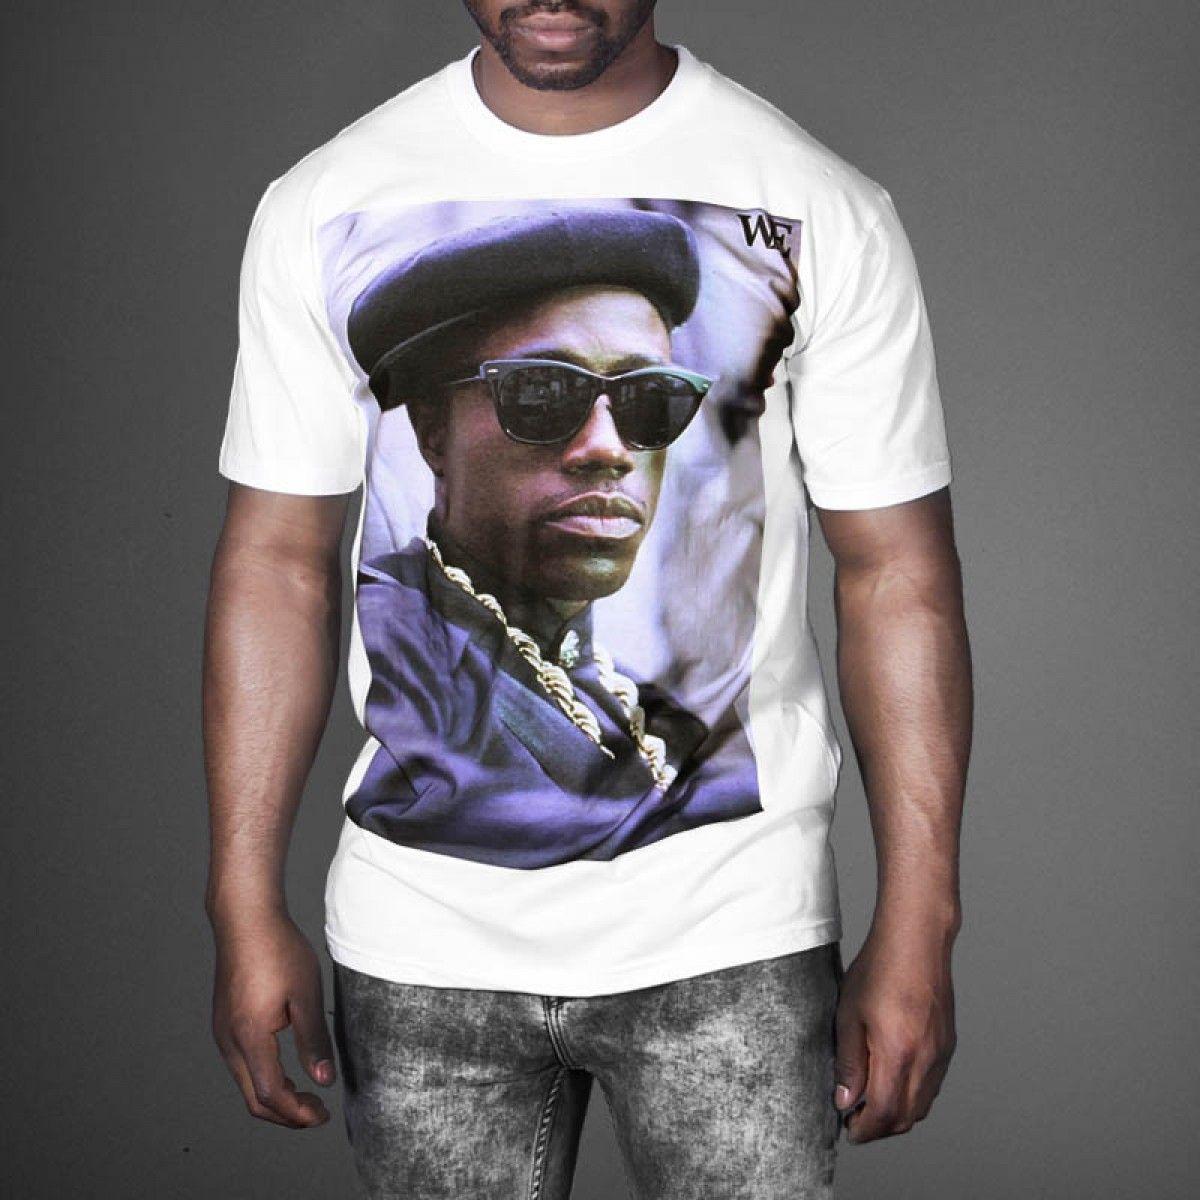 New Jack City T shirt; Wesley Snipes Nino Brown New Jack City Tee shirt